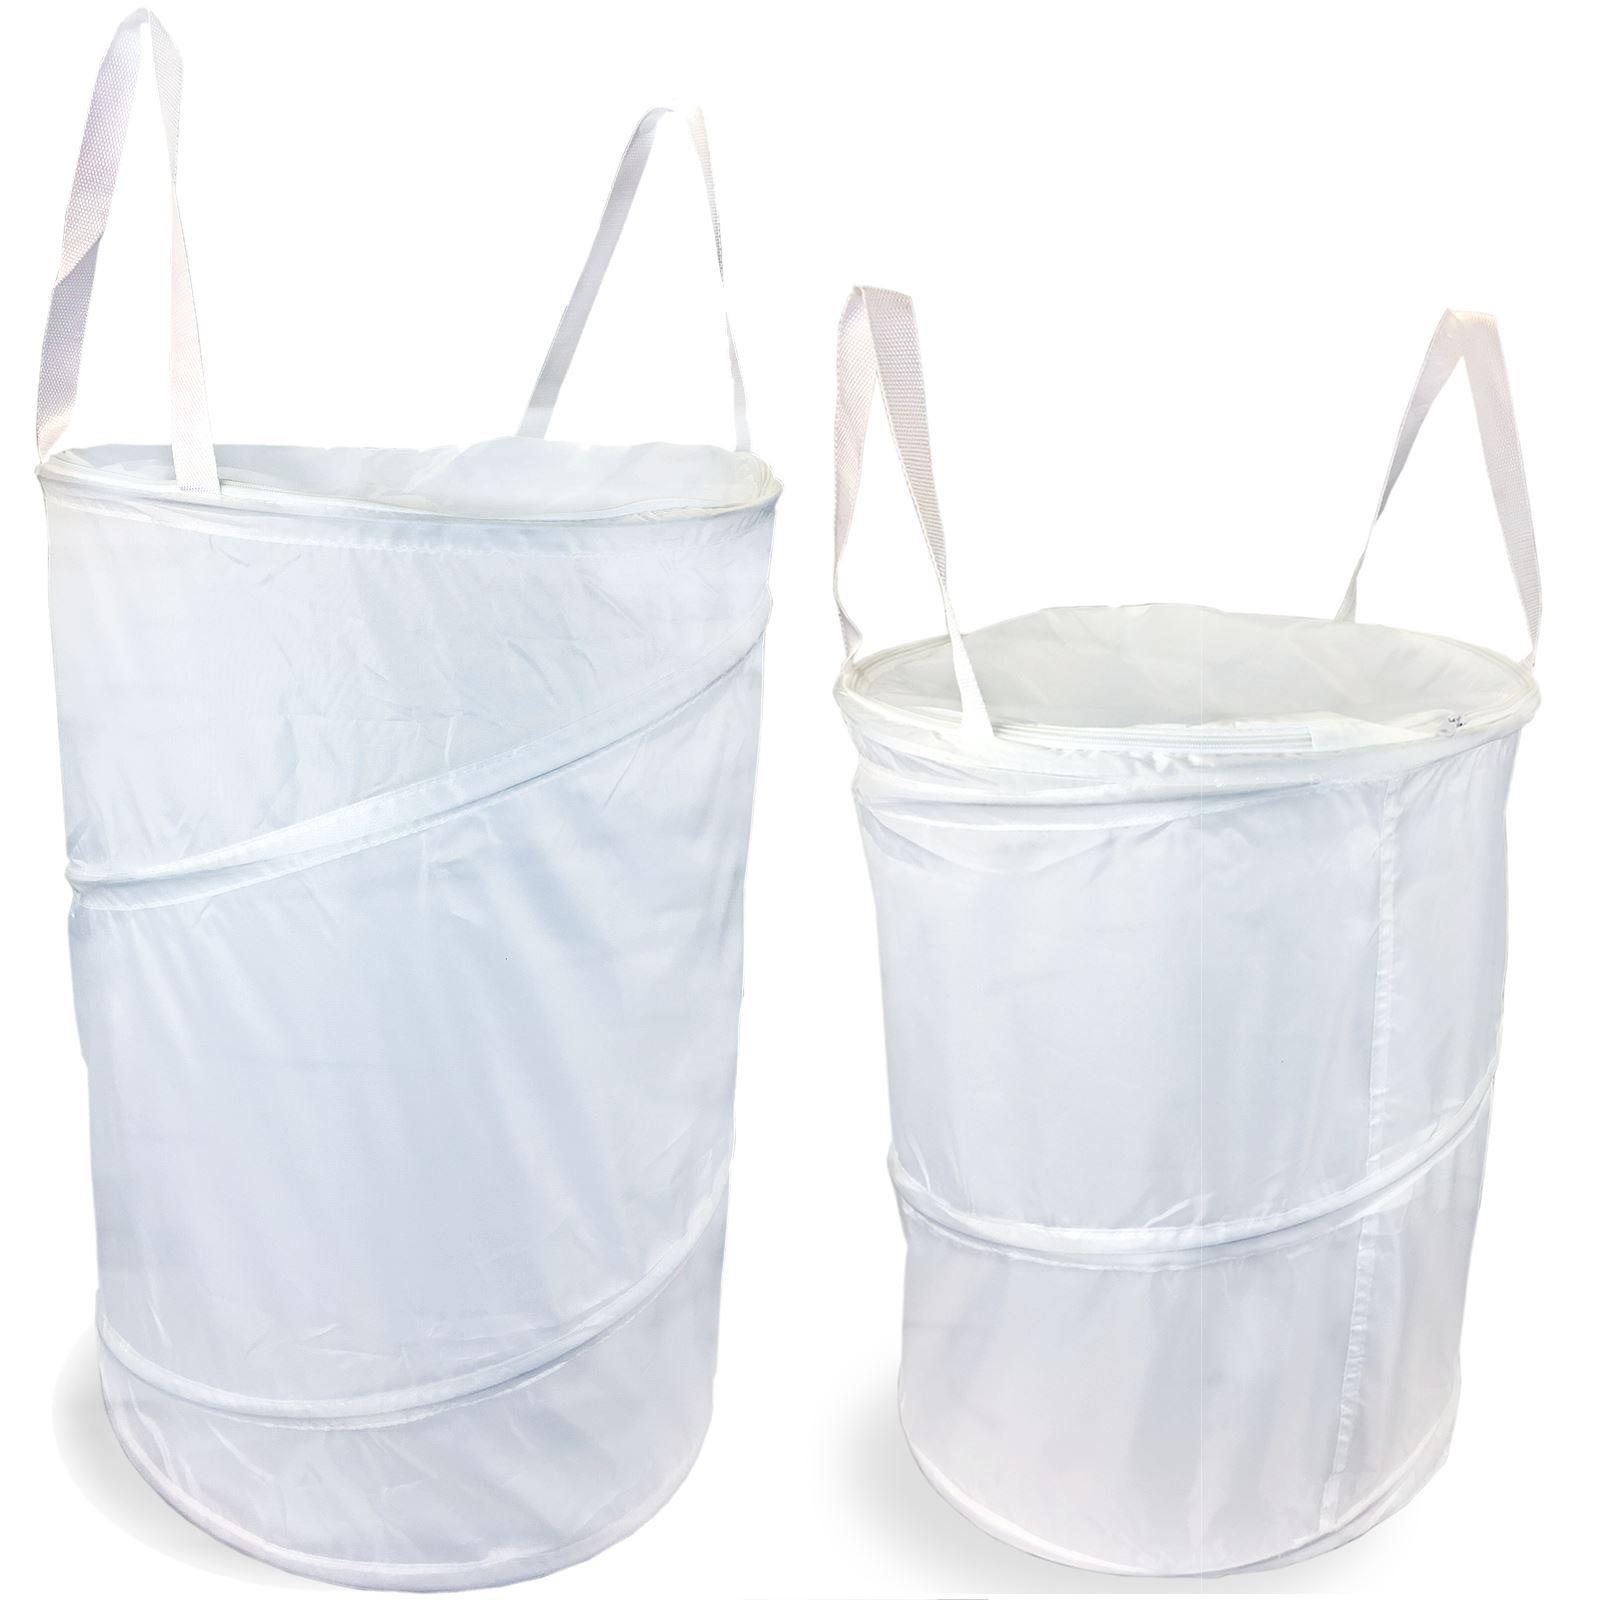 Washing Basket, 150 Litre, 1 Large Laundry Bag SIMPA/® 150L Litre Extra Large Pop Up Laundry Hamper Bin Washing Basket Fold Away Clothes Bag Bathroom Storage with Zippable Lid Laundry Basket